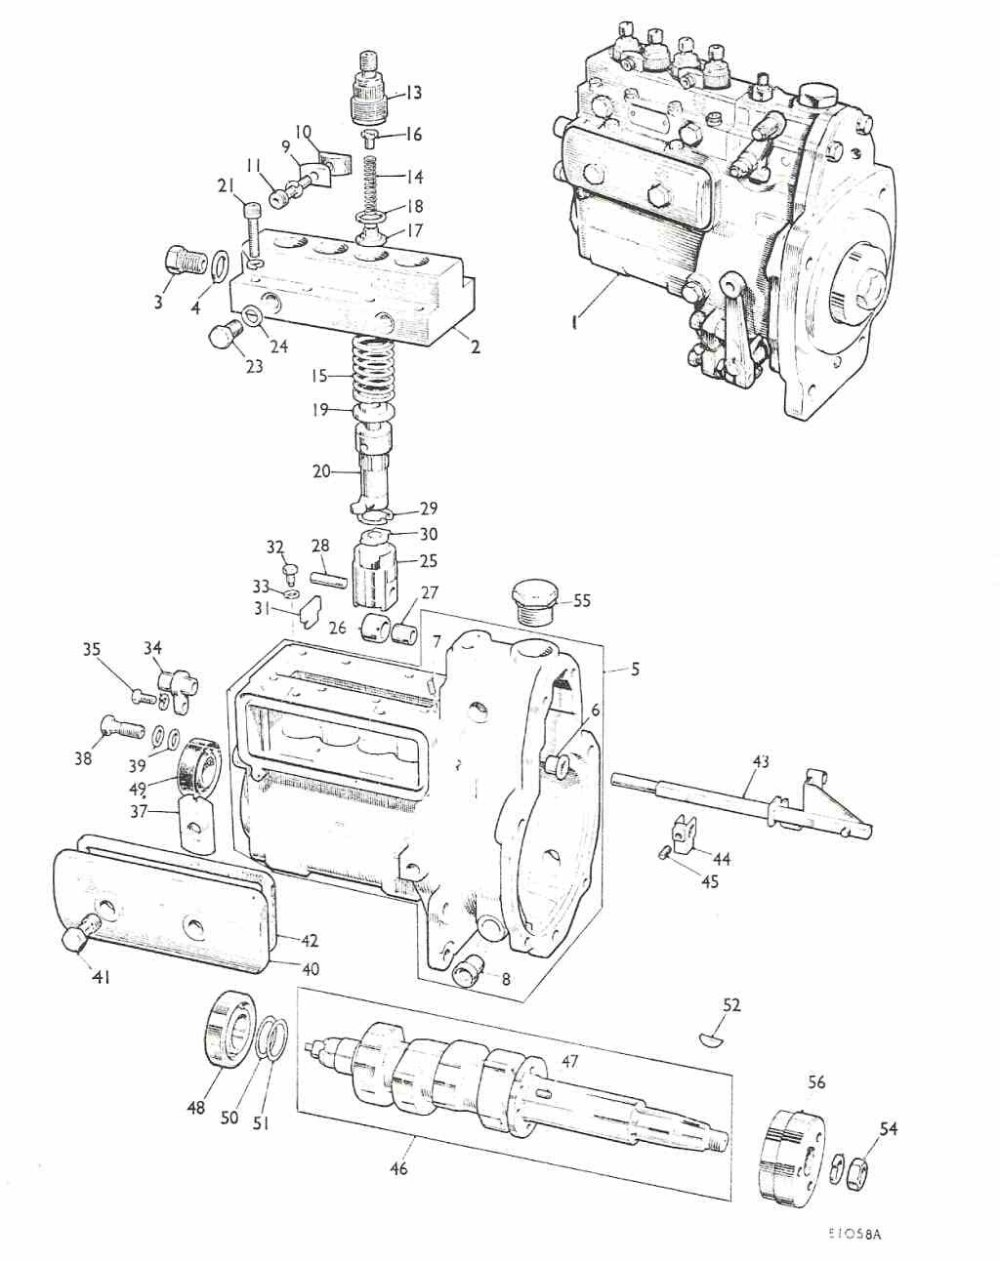 medium resolution of plunger and element for simms minimec pumps 8 0mm diesel zetor 5211 parts diagram zetor 3320 parts